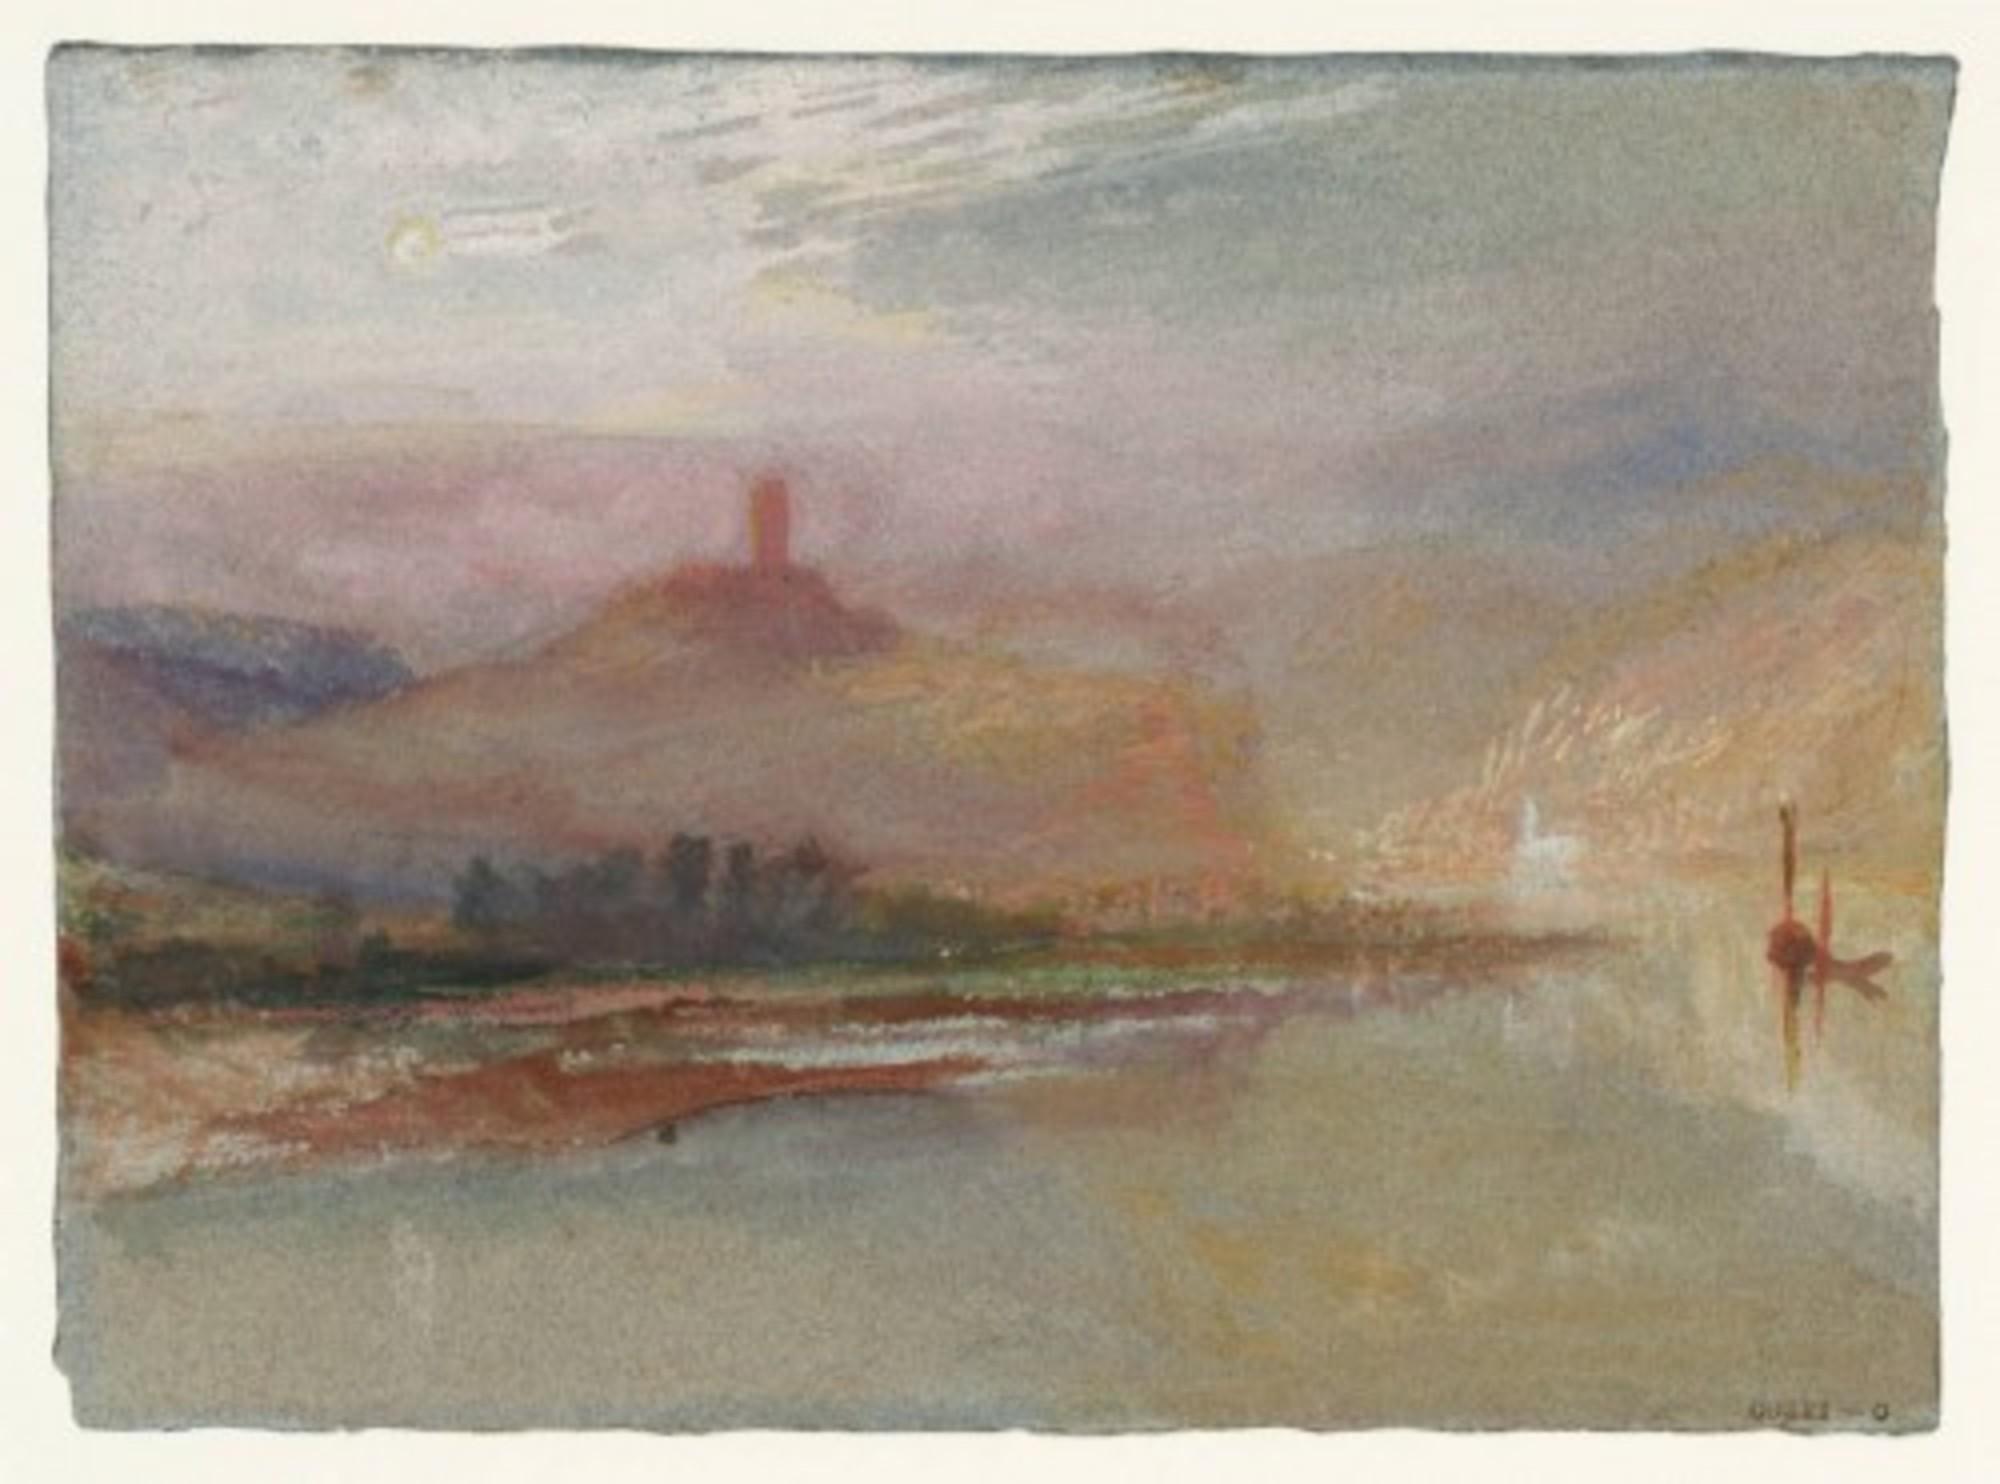 Wolf-near-Trarbach-on-the-Moselle-1826.jpg